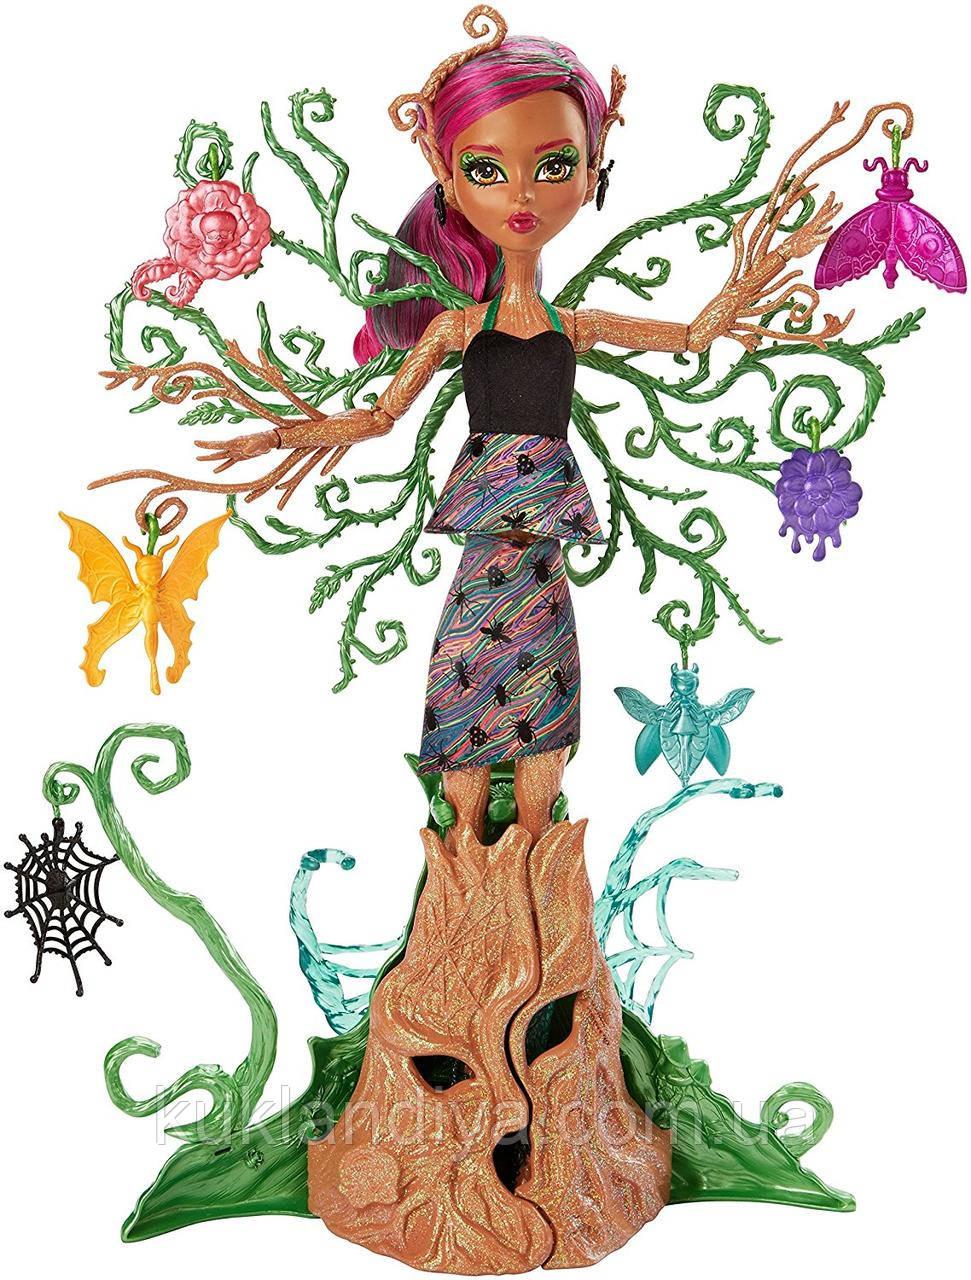 Лялька Monster High Триза Торнвиллоу Королева саду - Treesa Thornwillow Garden Ghouls